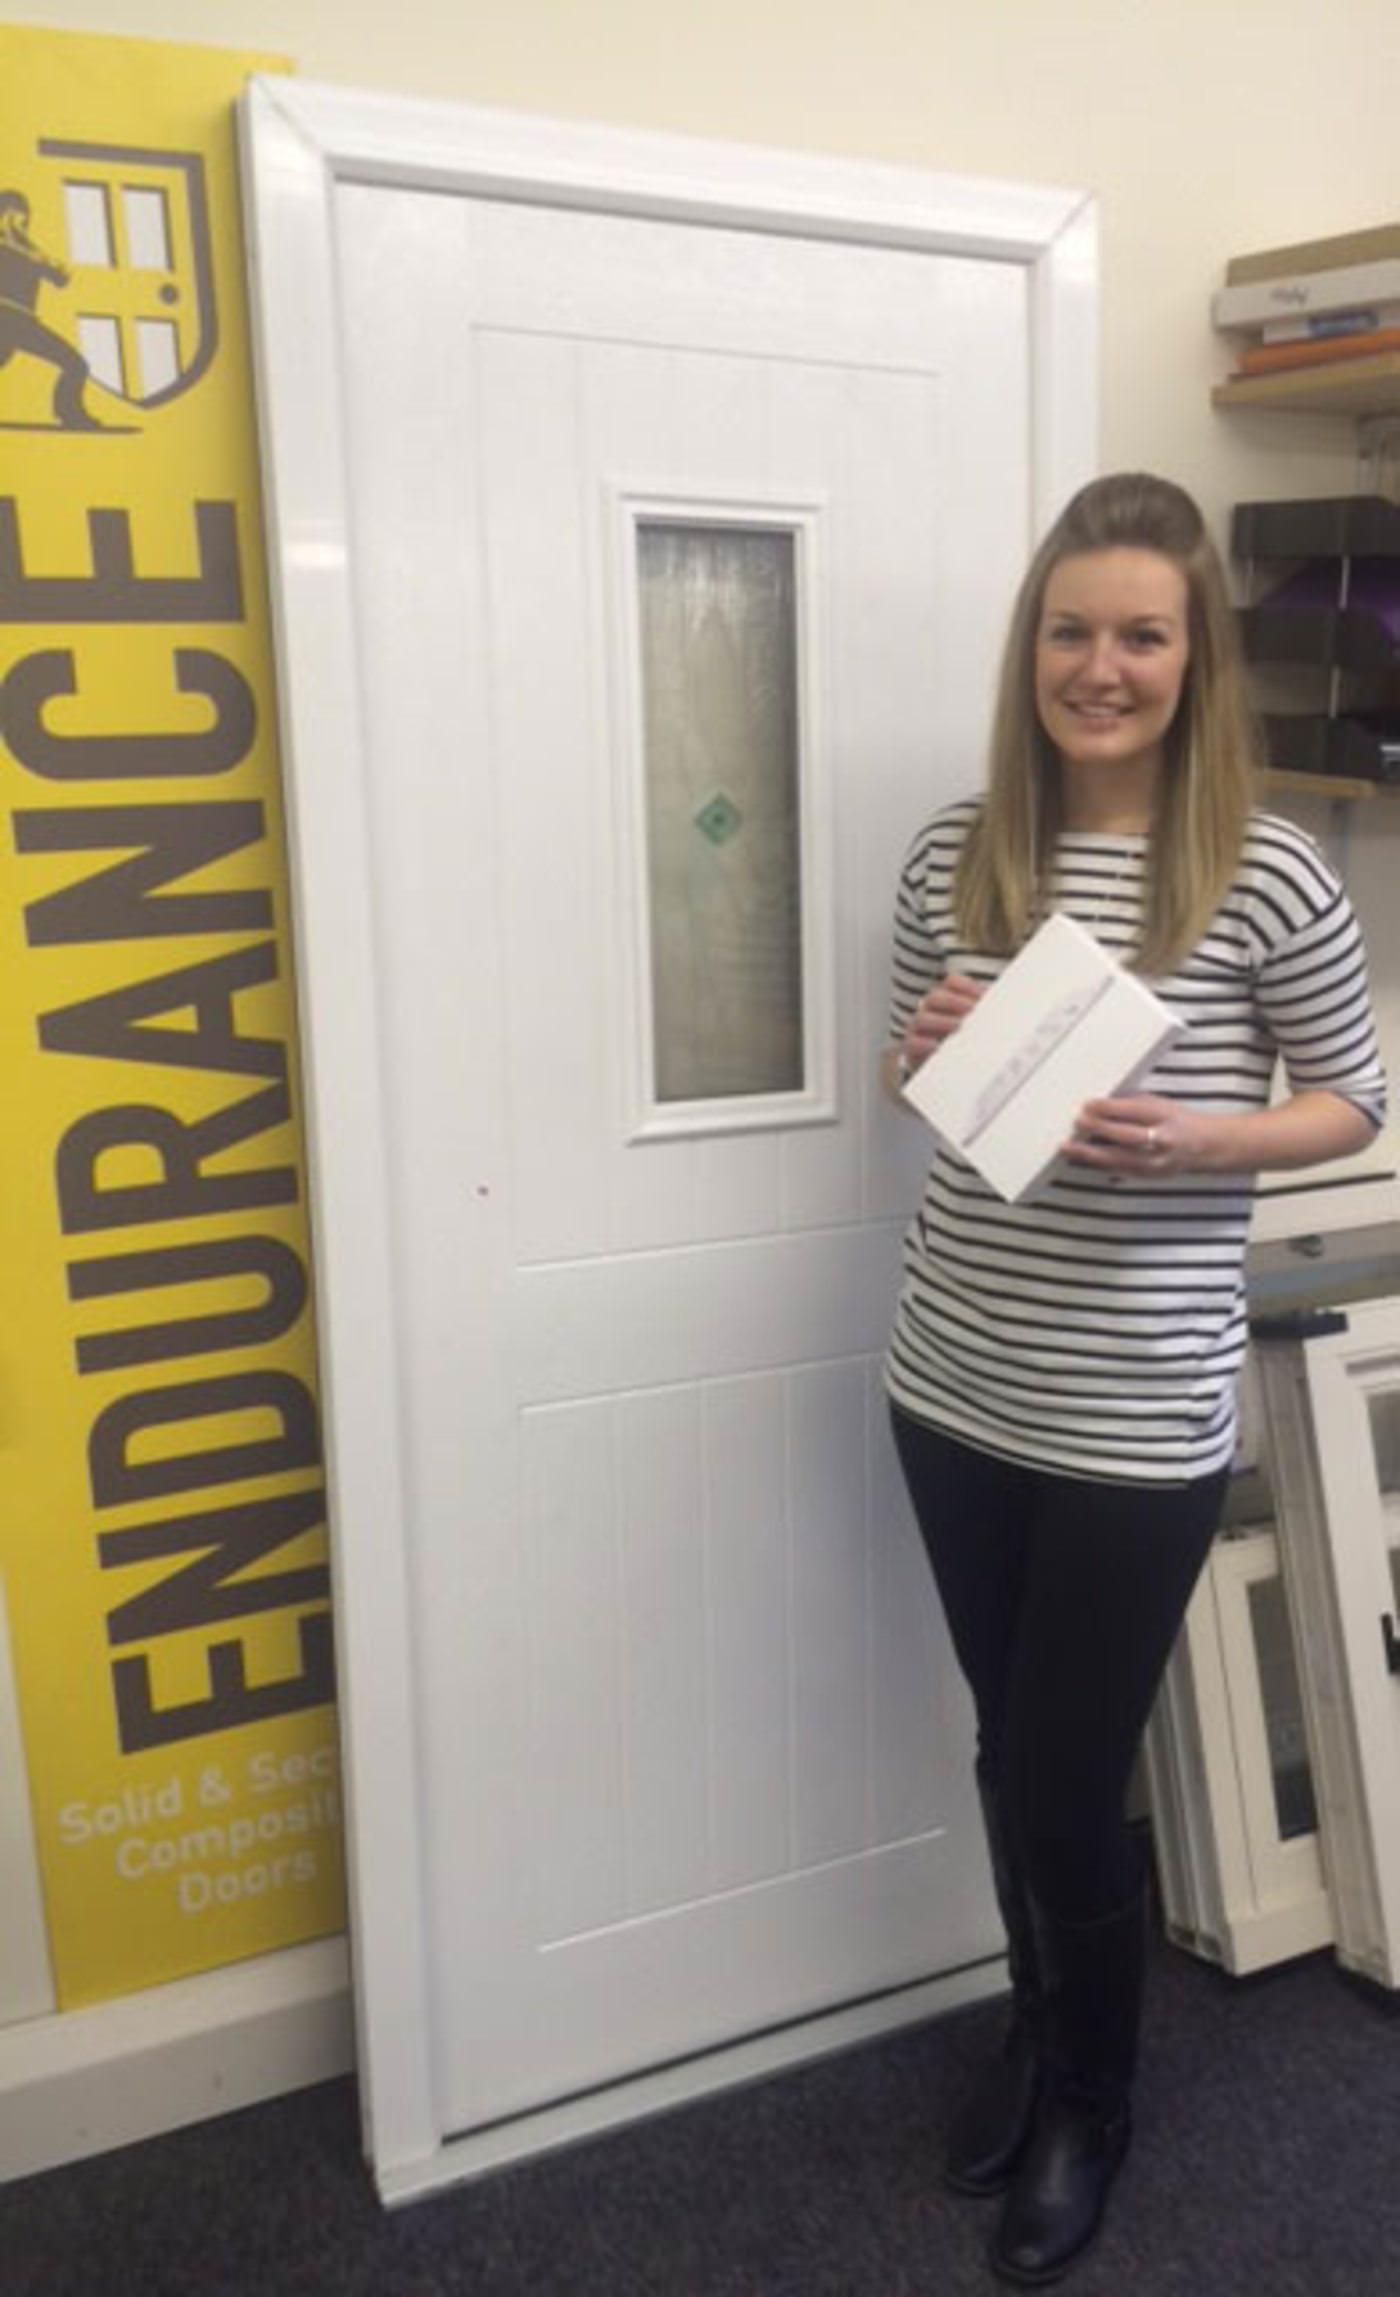 Winner 1  sc 1 st  Endurance Doors & Masterpiece of the Month November Winner Announced | Endurance®